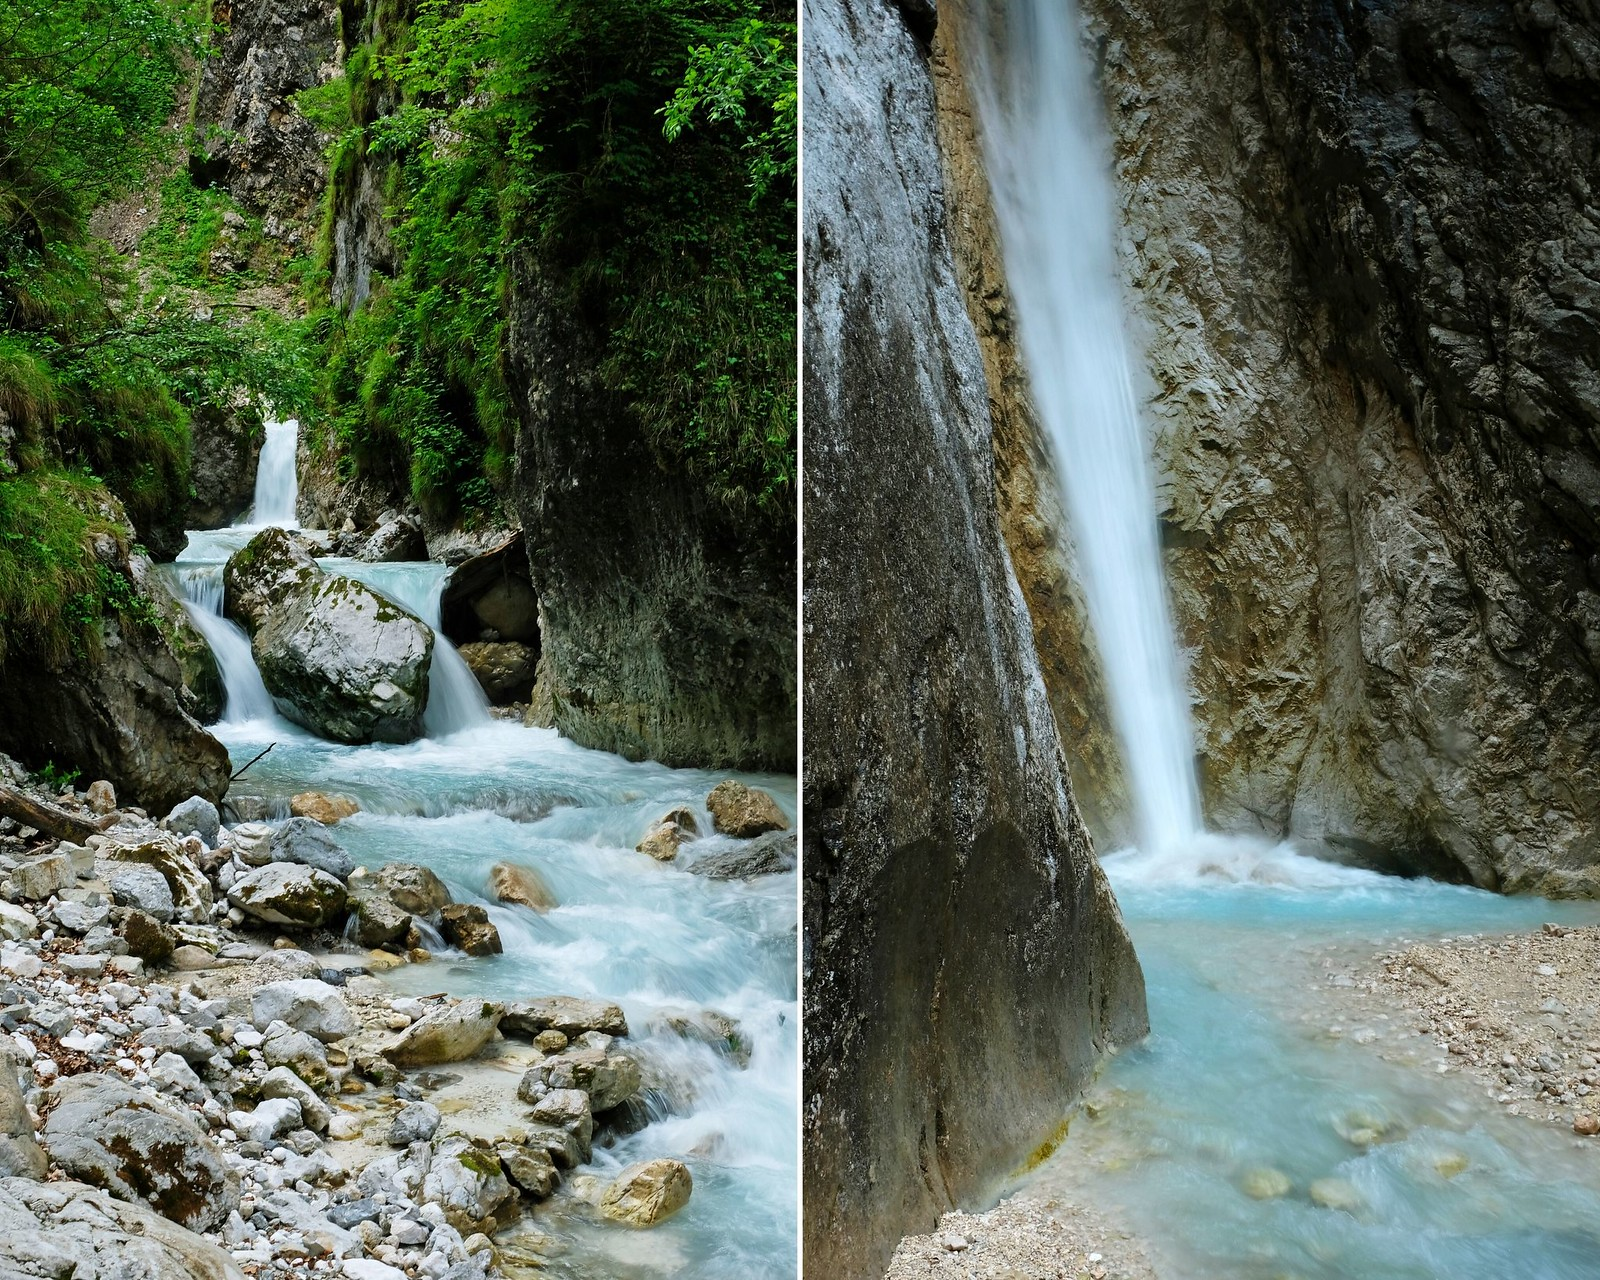 Martuljek Gorge & Upper Martuljek Fall, Slovenia